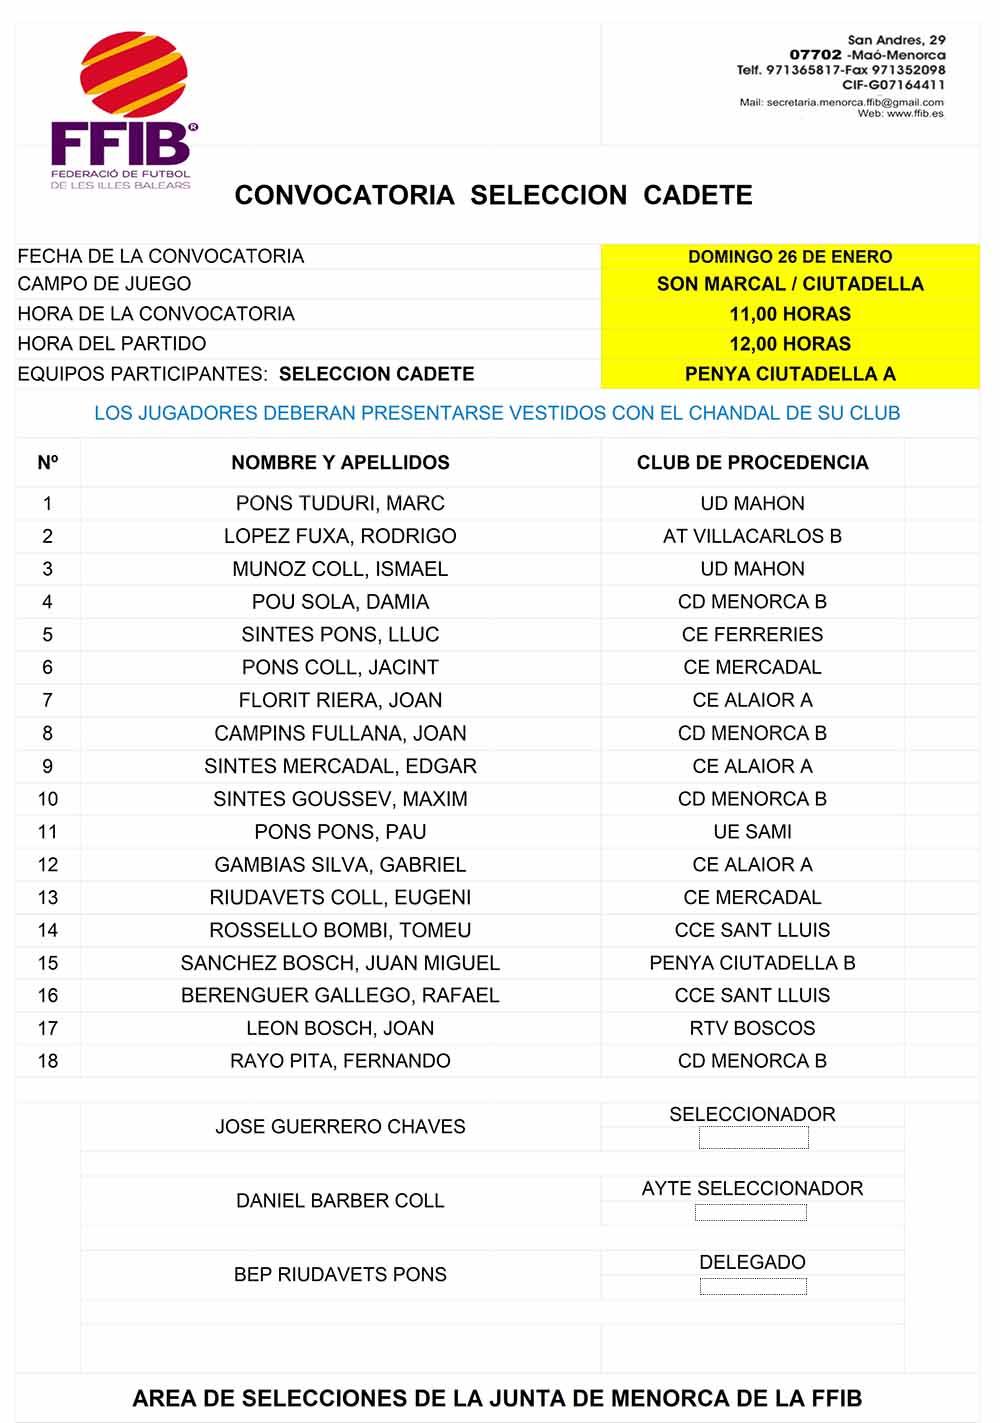 seleccion cadete 26 ENERO (12)